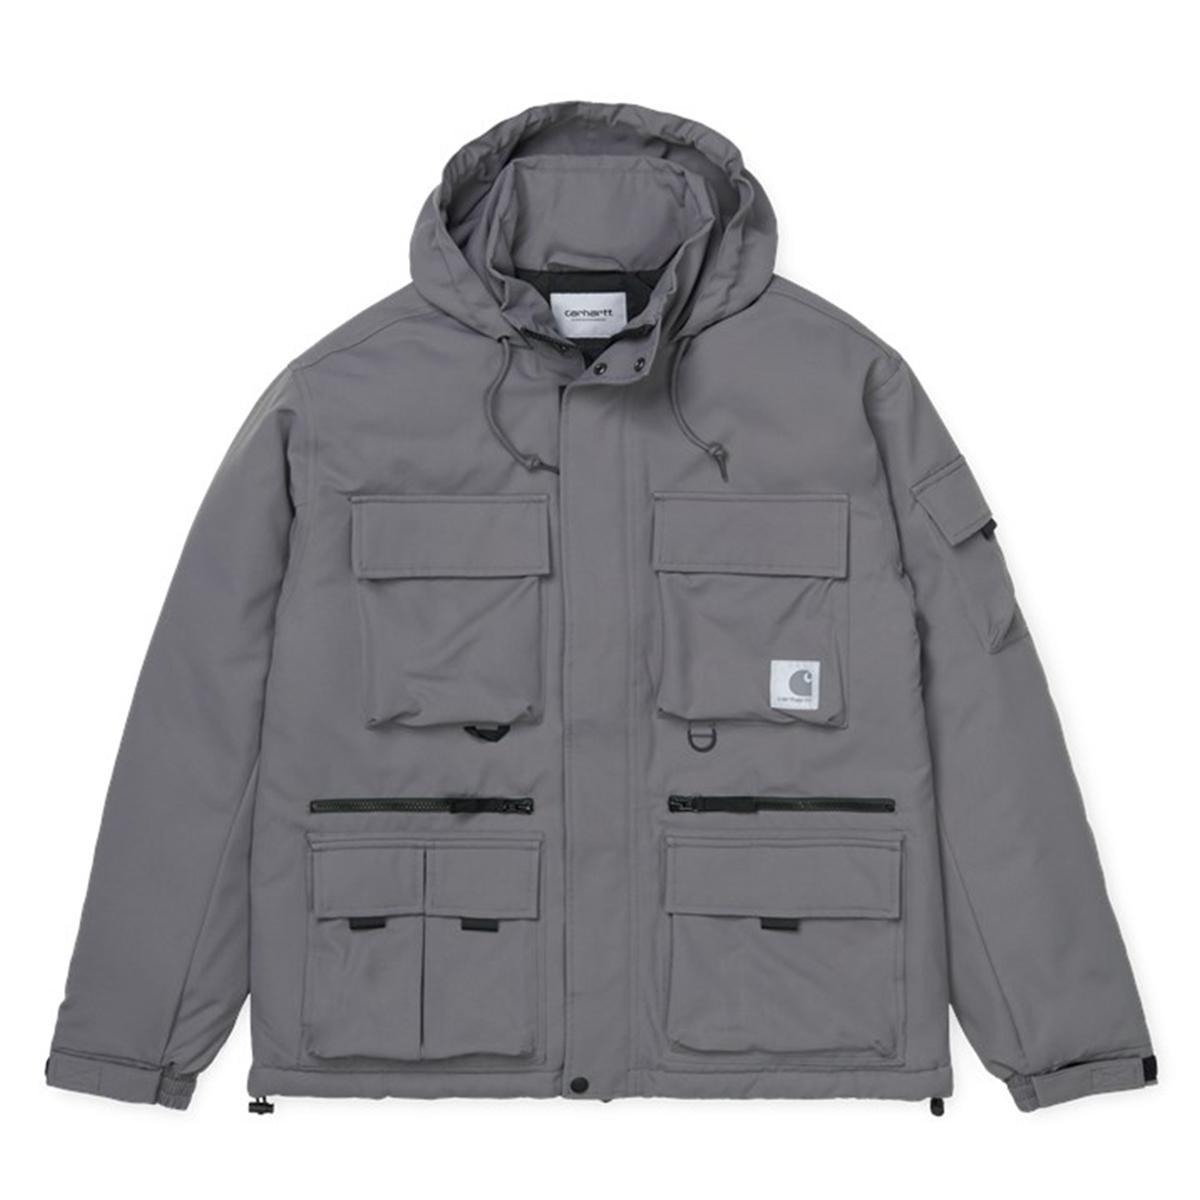 Colewood Jacket